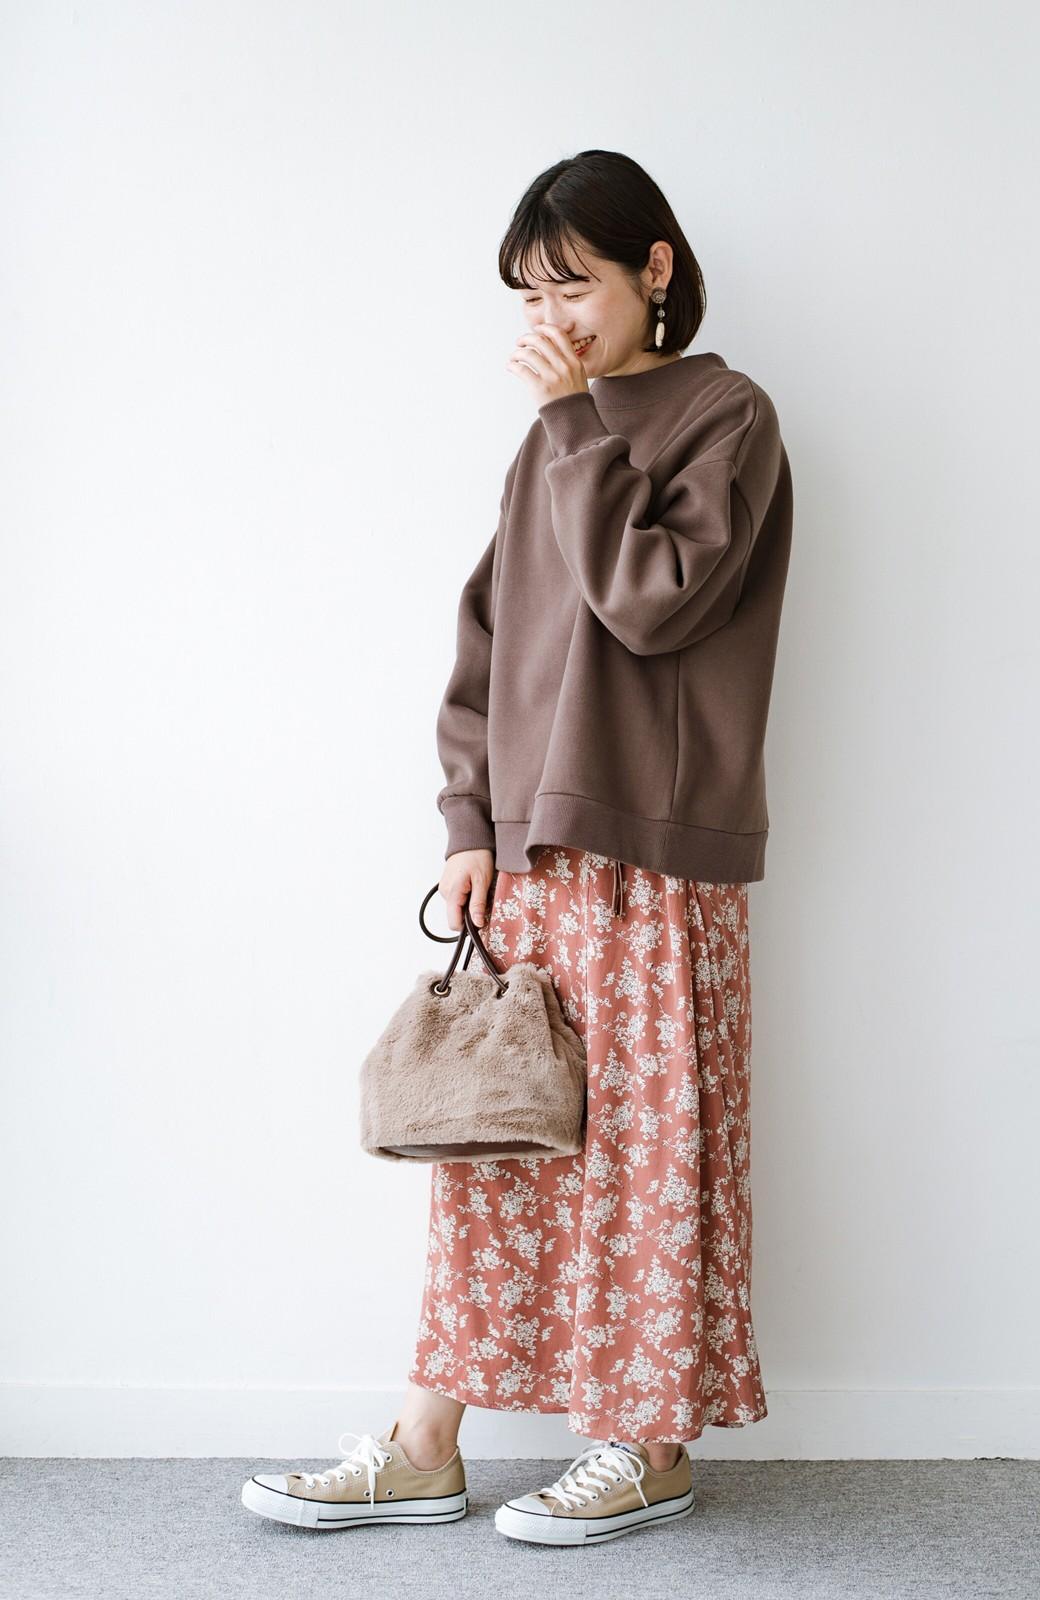 haco! さっと持って気分が上がる ふわっとかわいいエコファー巾着バッグ <グレイッシュベージュ>の商品写真12